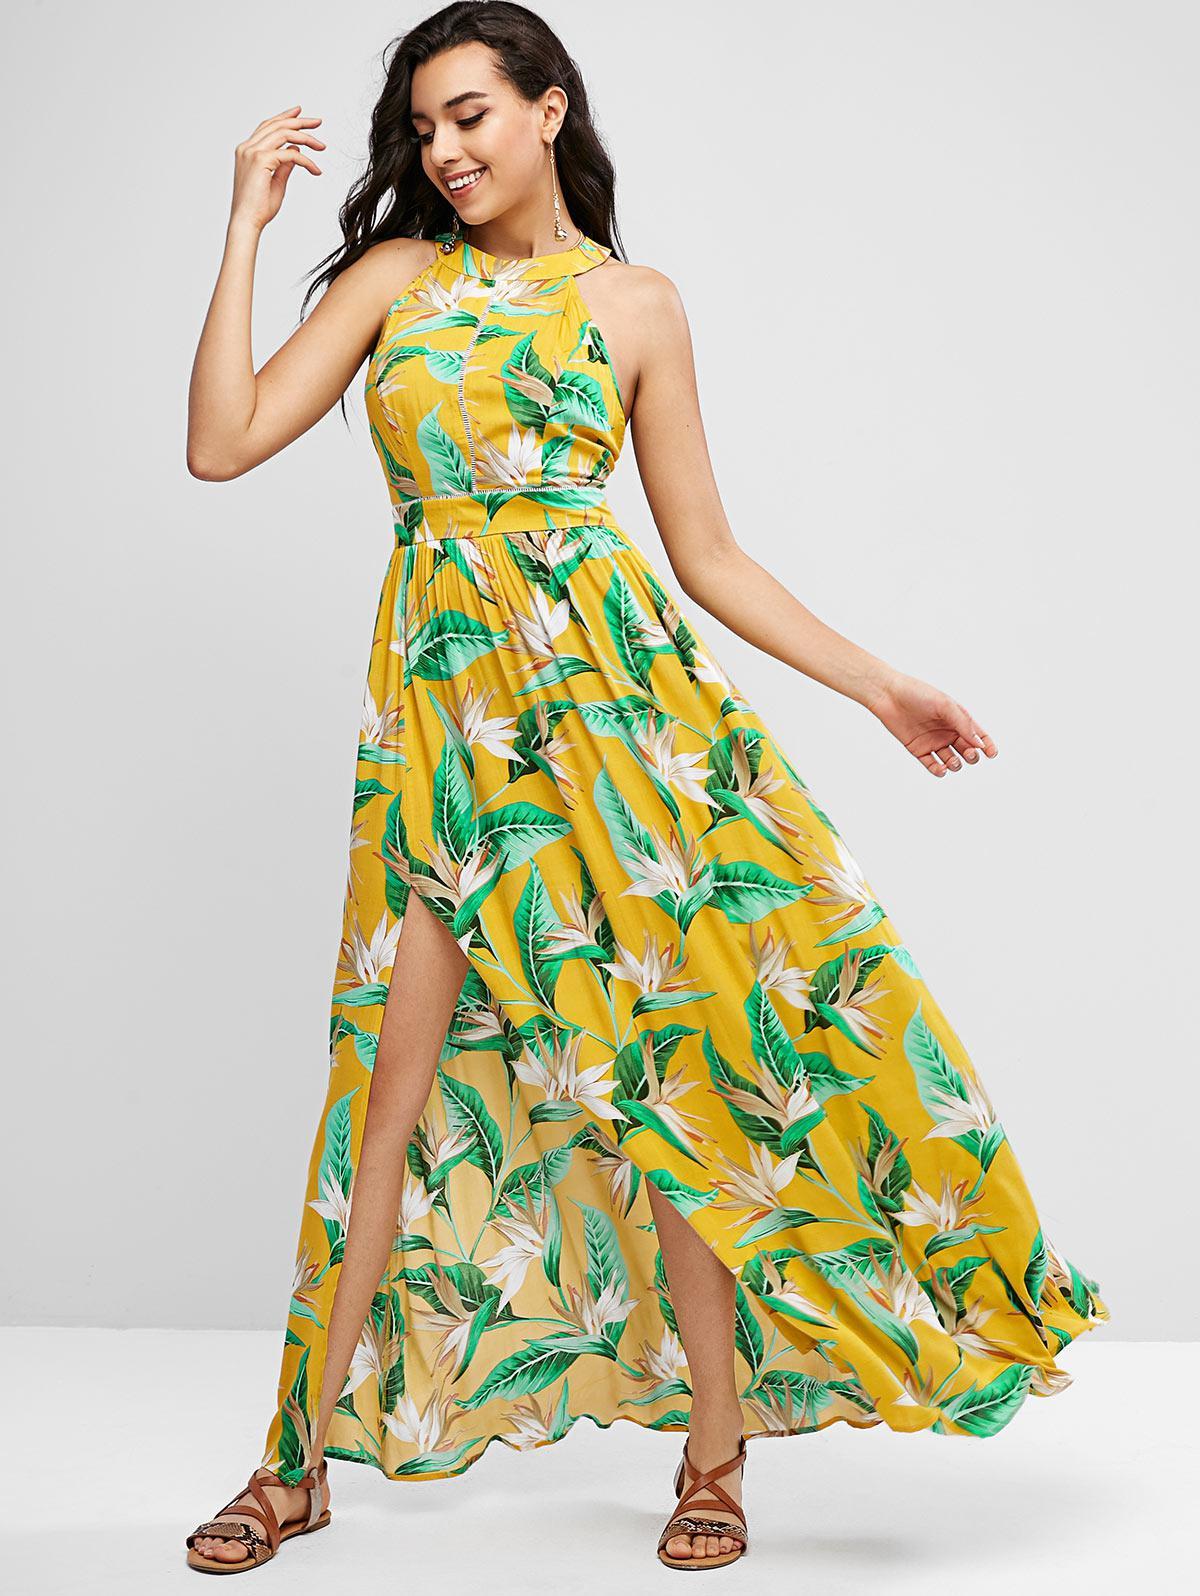 ZAFUL Floral Leaves Cutout Slit Maxi Dress